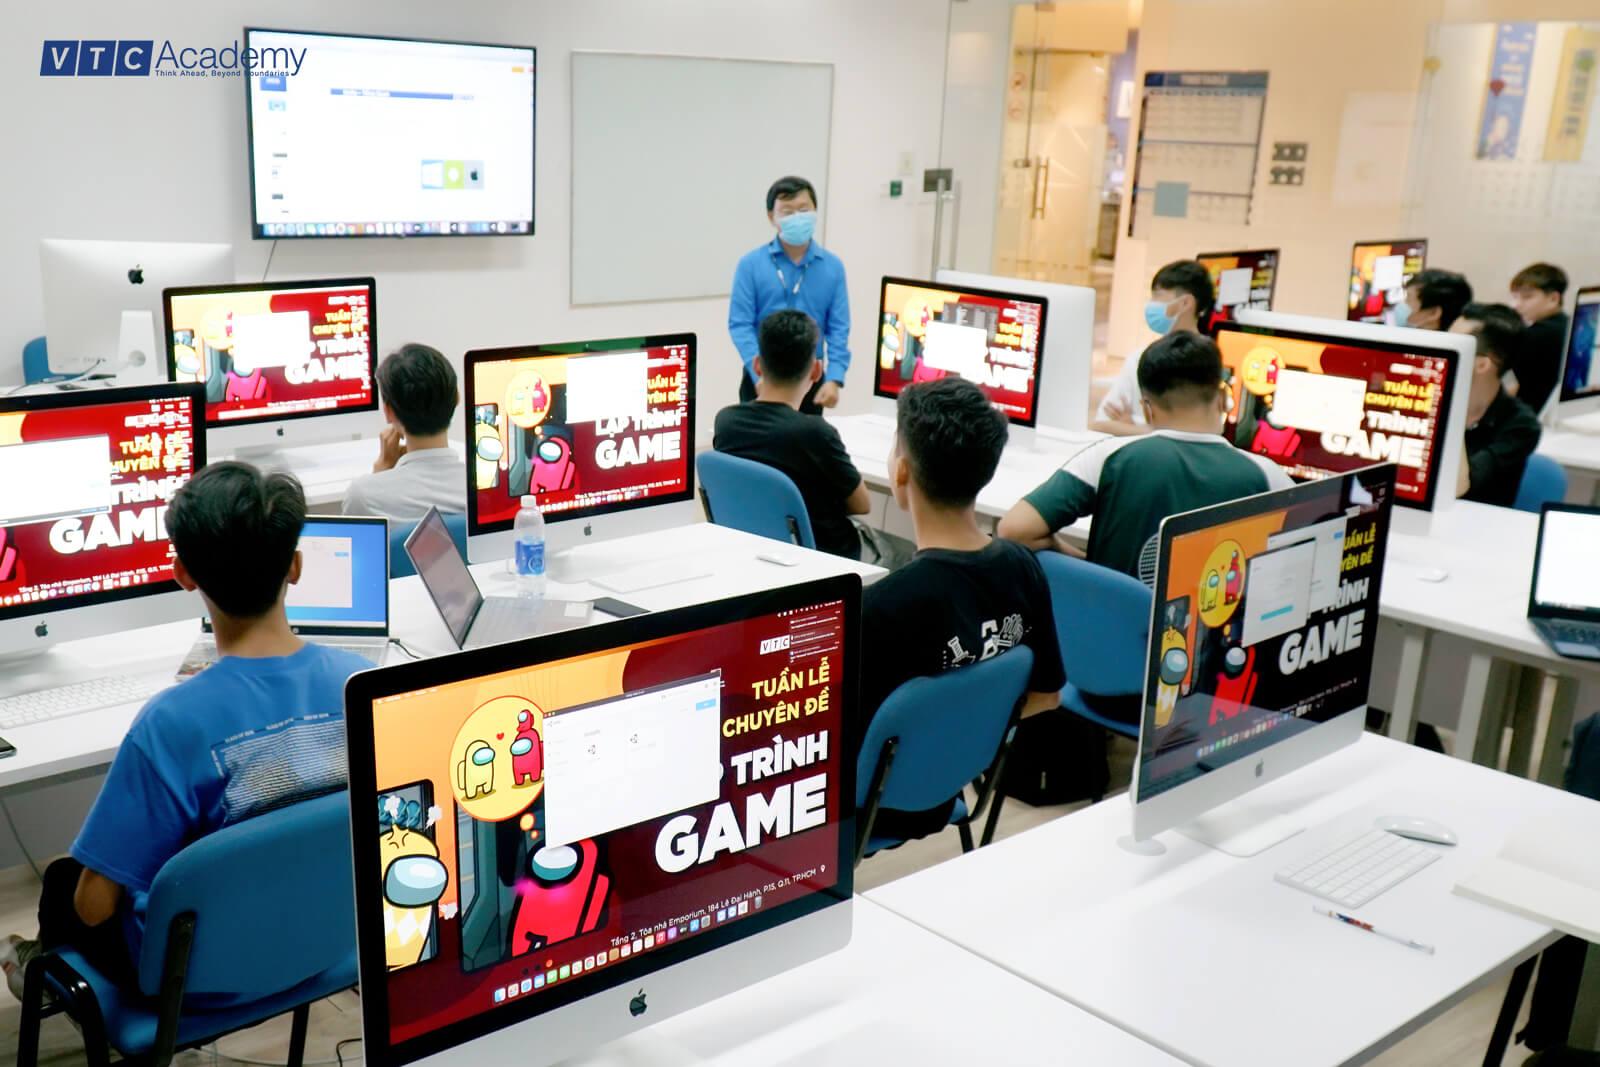 vtc-academy-hoc-thu-lap-trinh-game-7